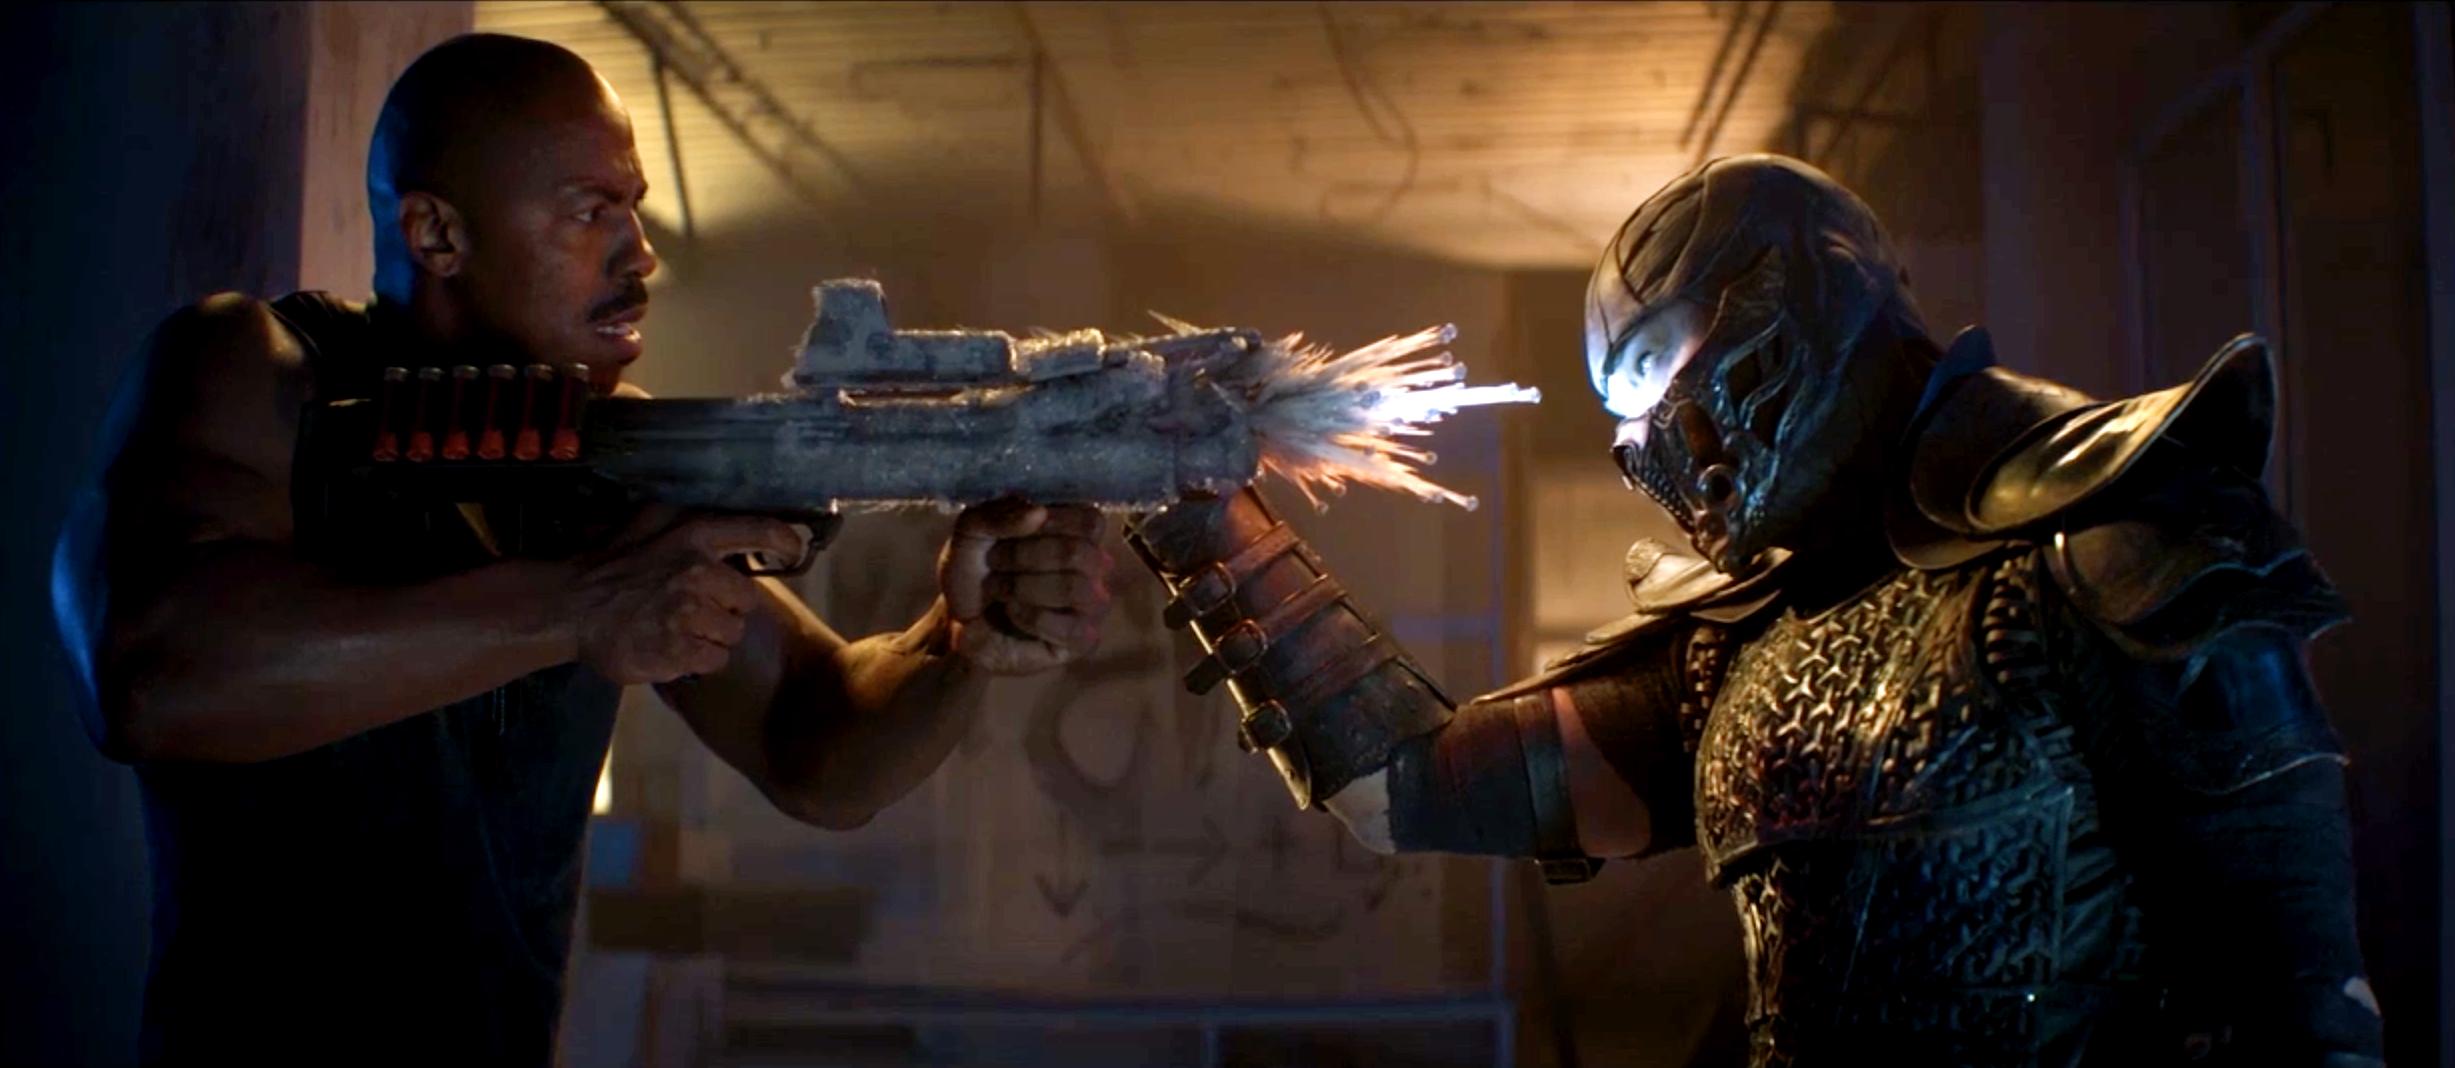 Mortal Kombat film